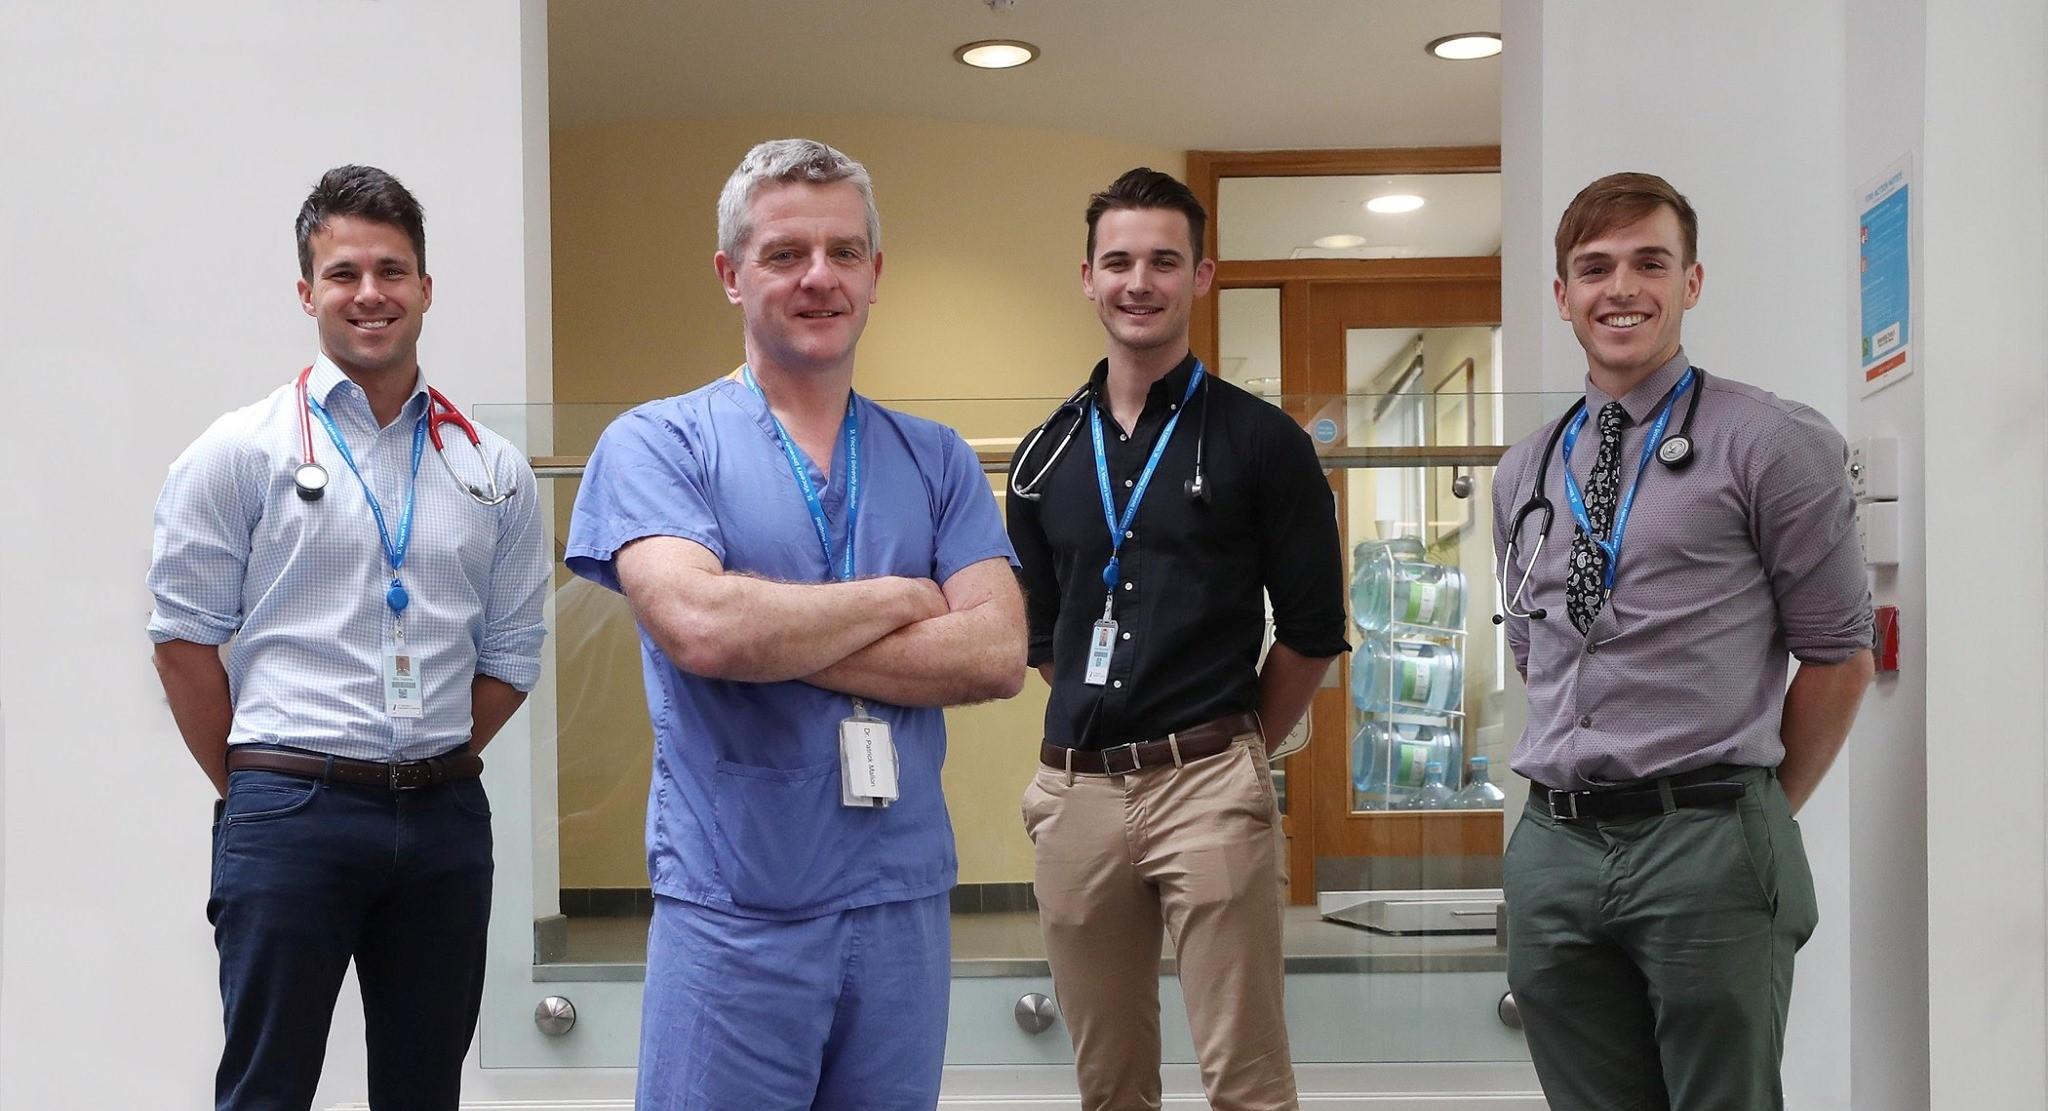 Irish doctors returned from Australia